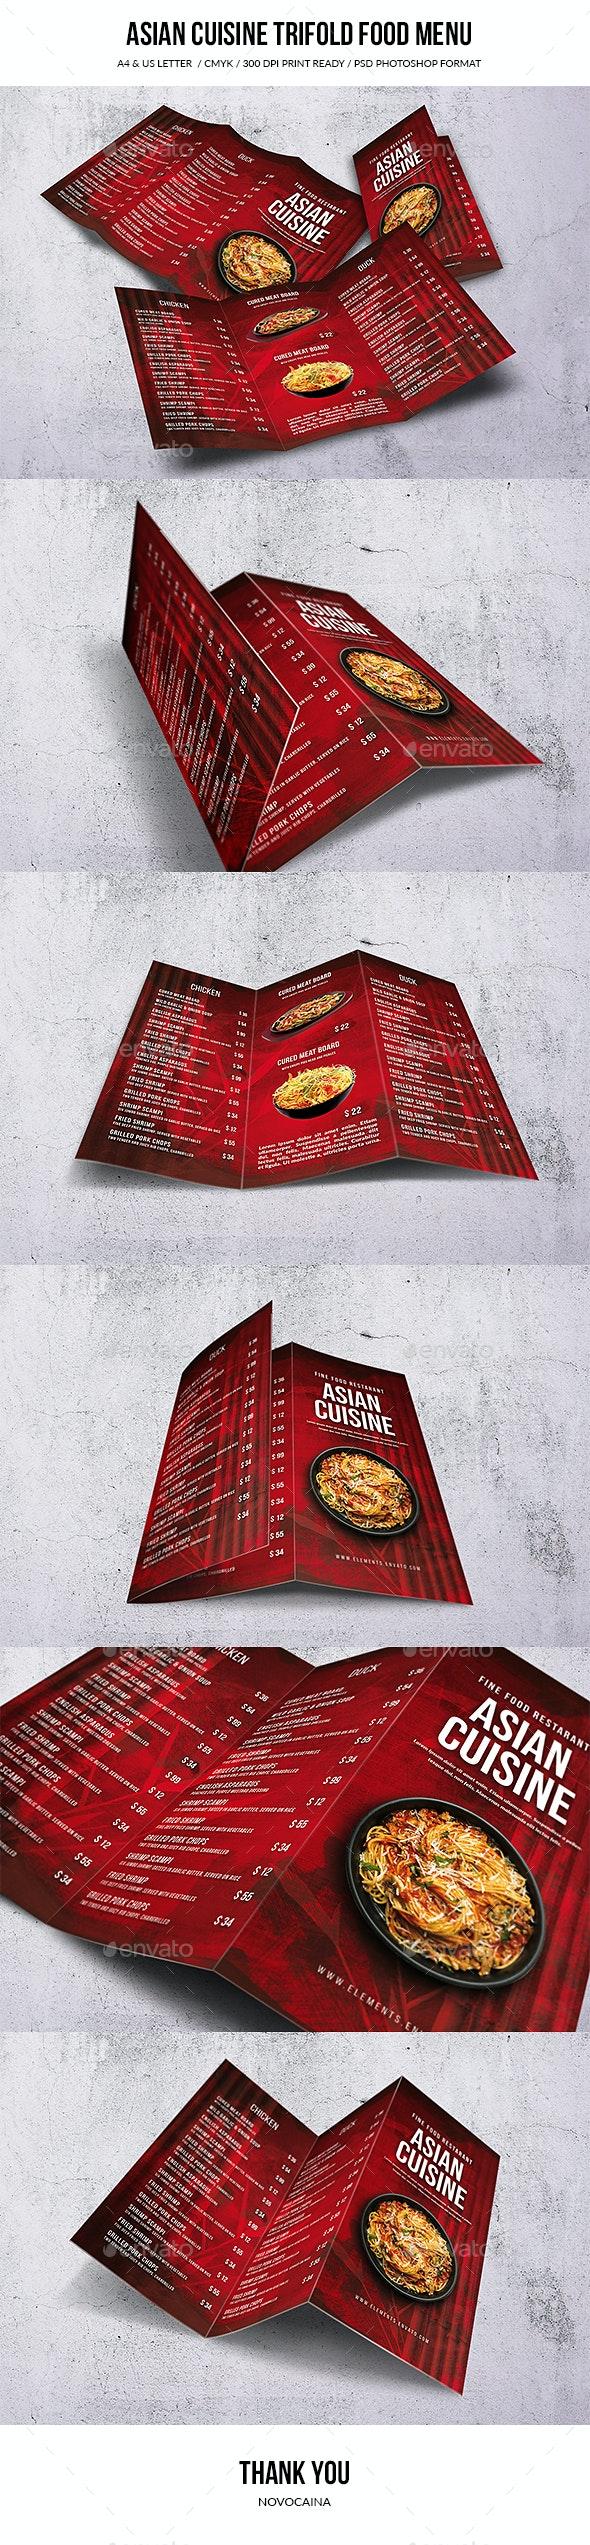 Asian Cuisine A4 & US Letter Trifold Food Menu - Food Menus Print Templates